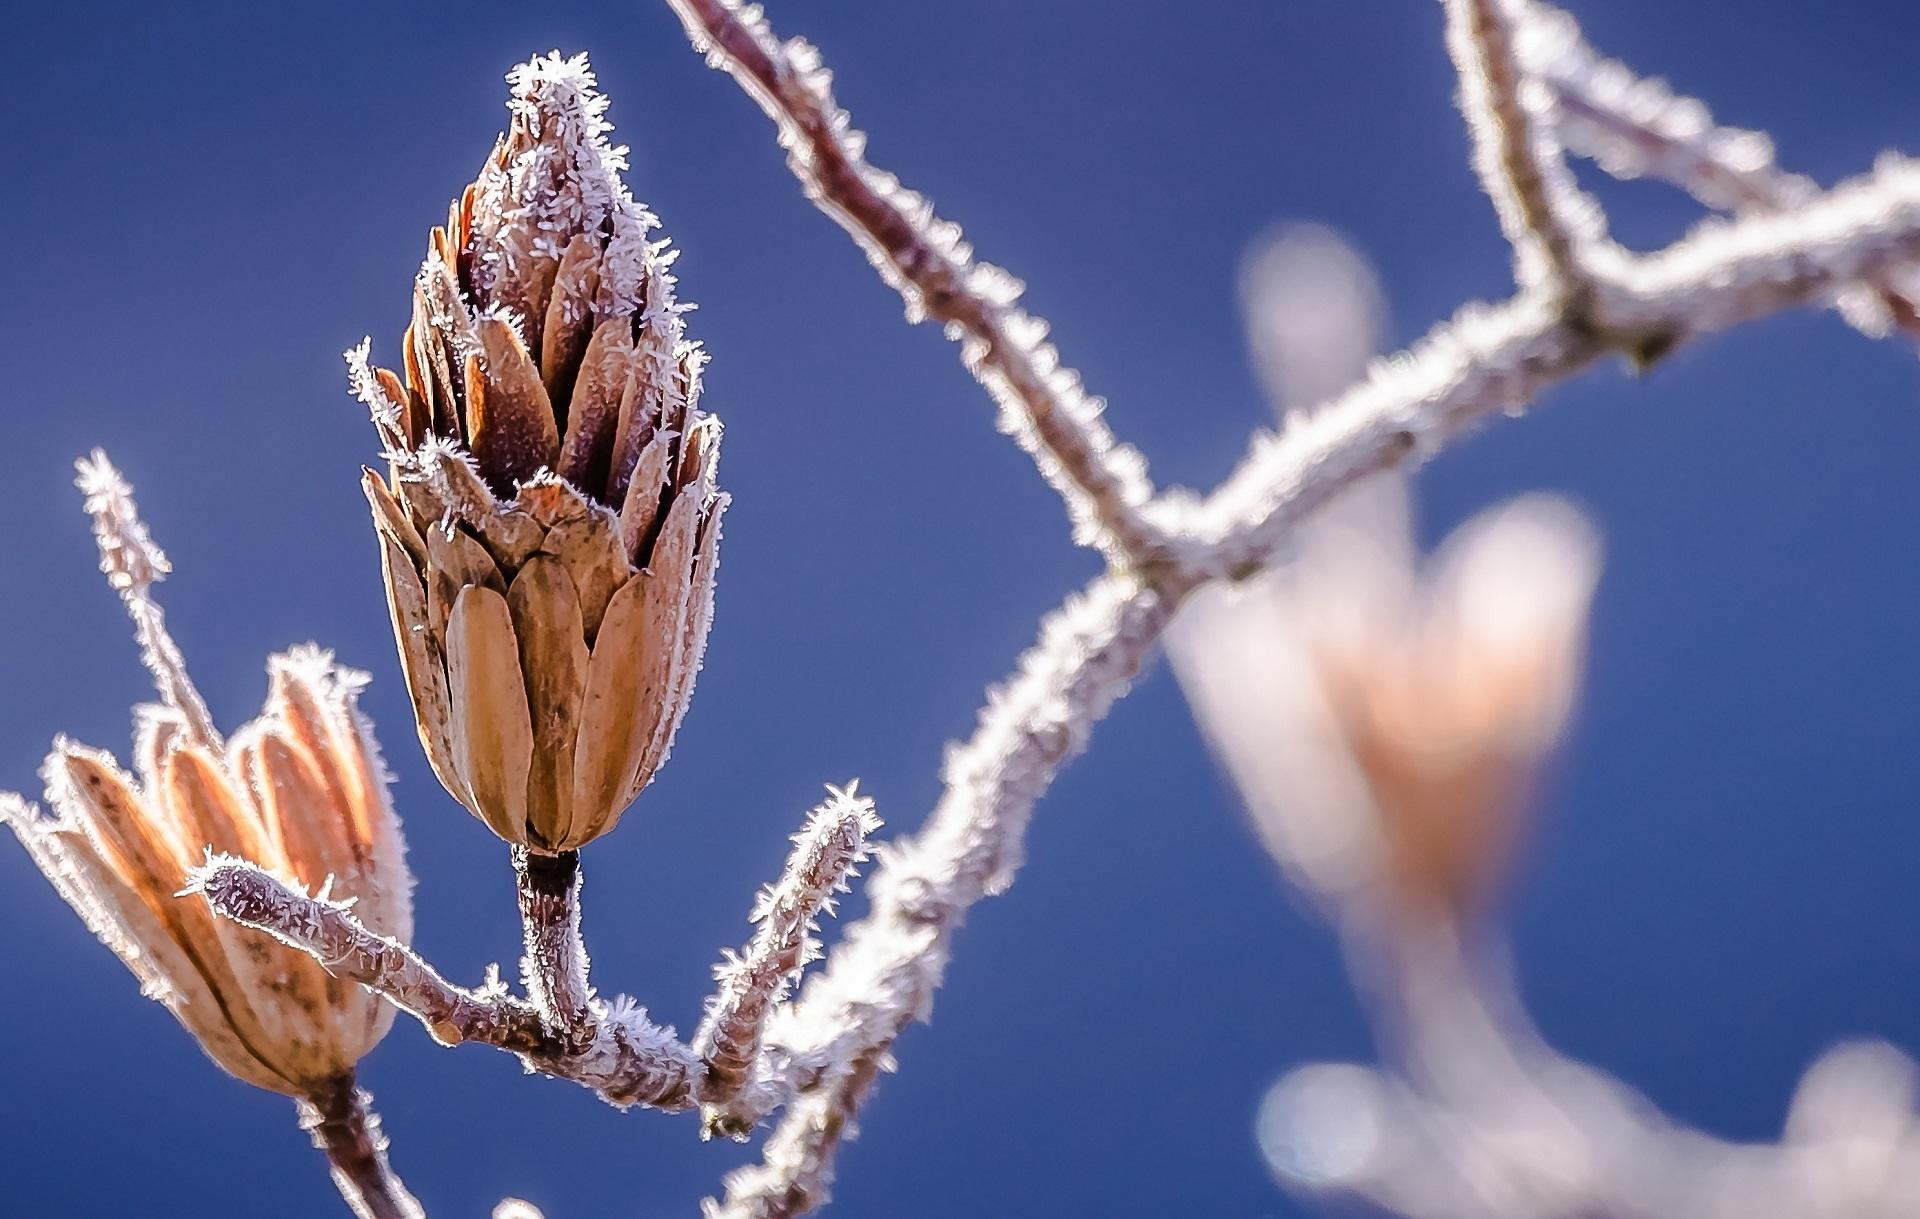 winter-nature-bud-branch-39677